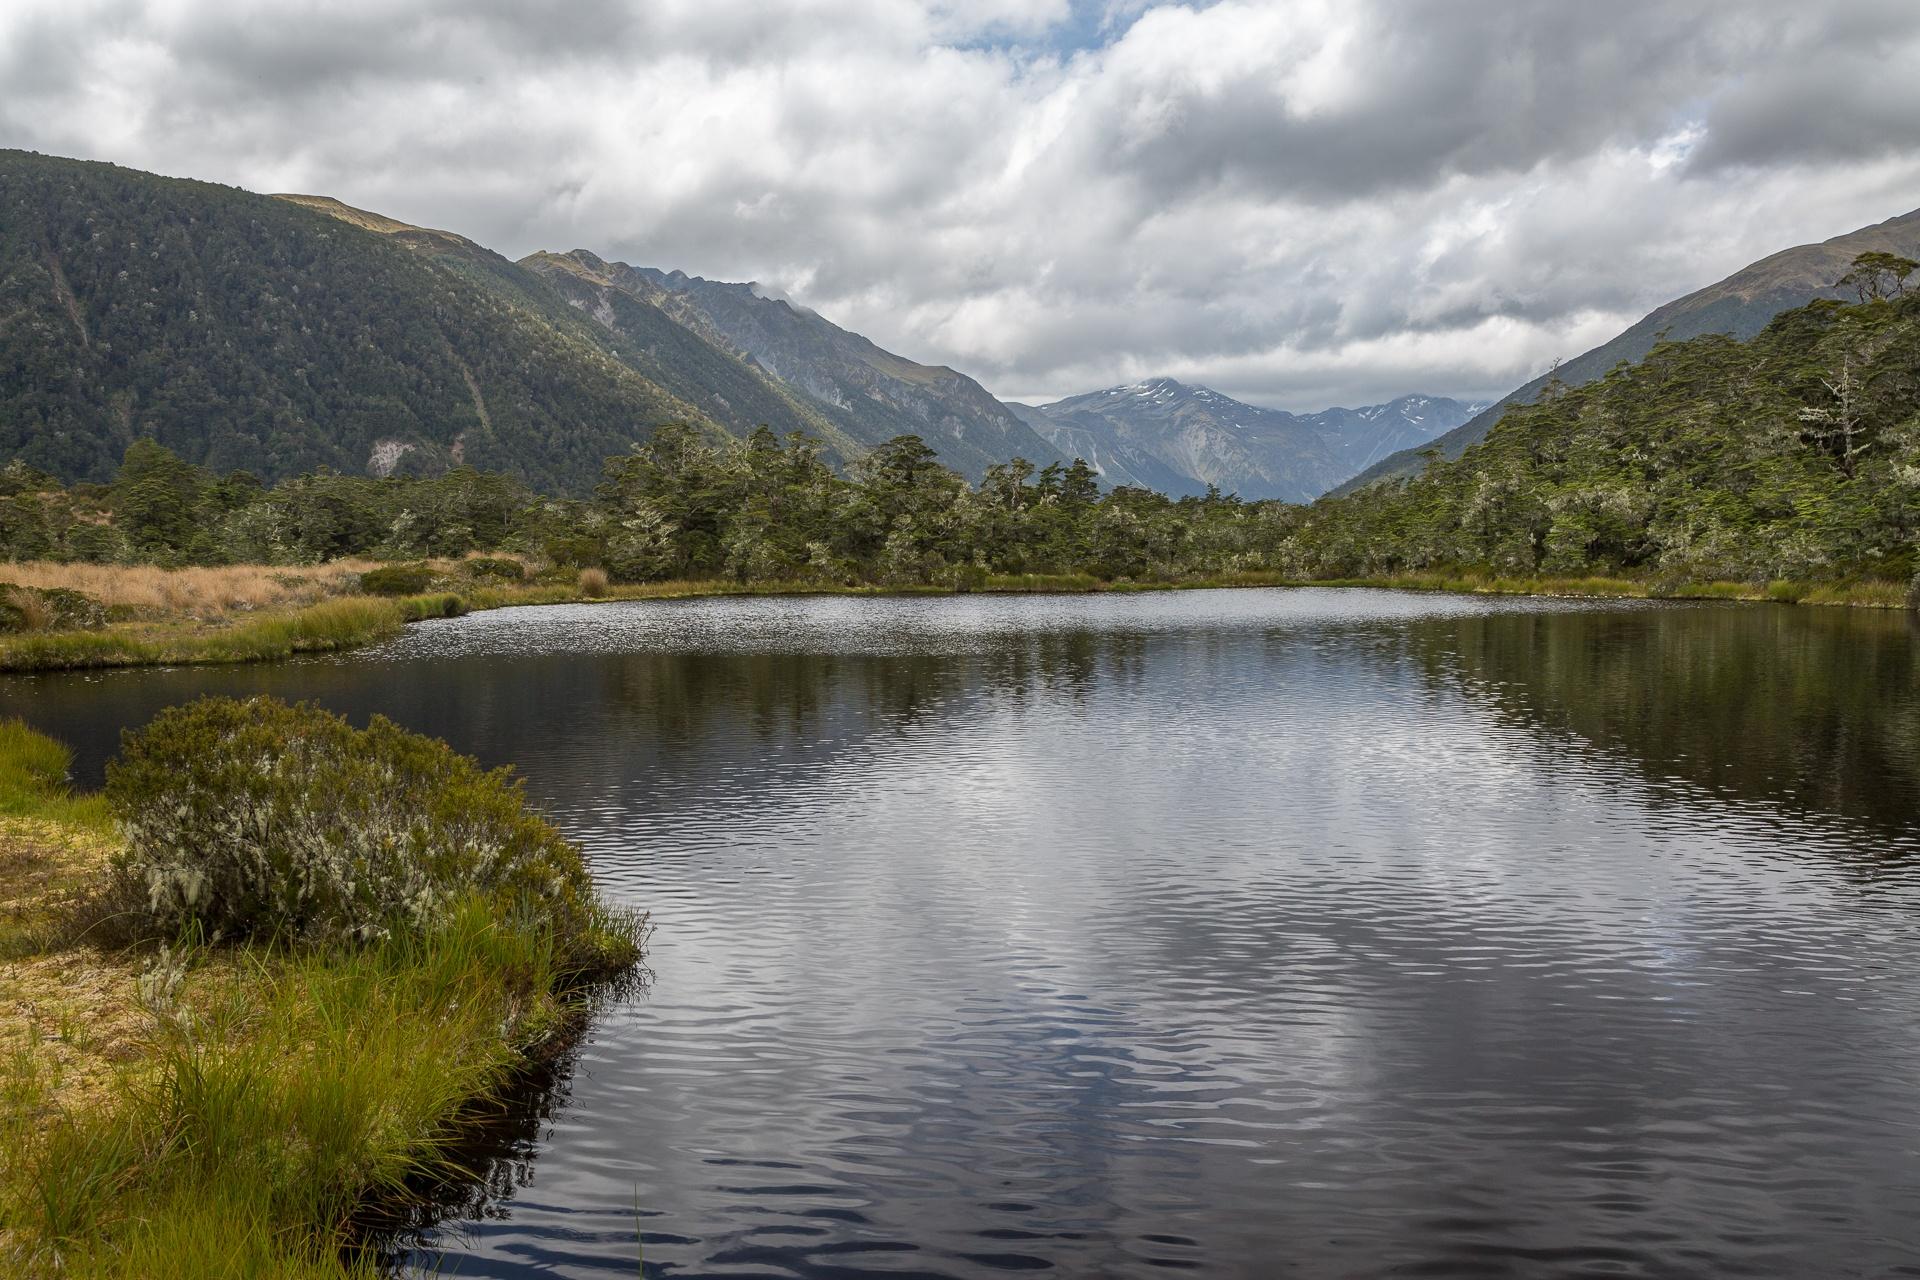 Moody lake scene in New Zealand